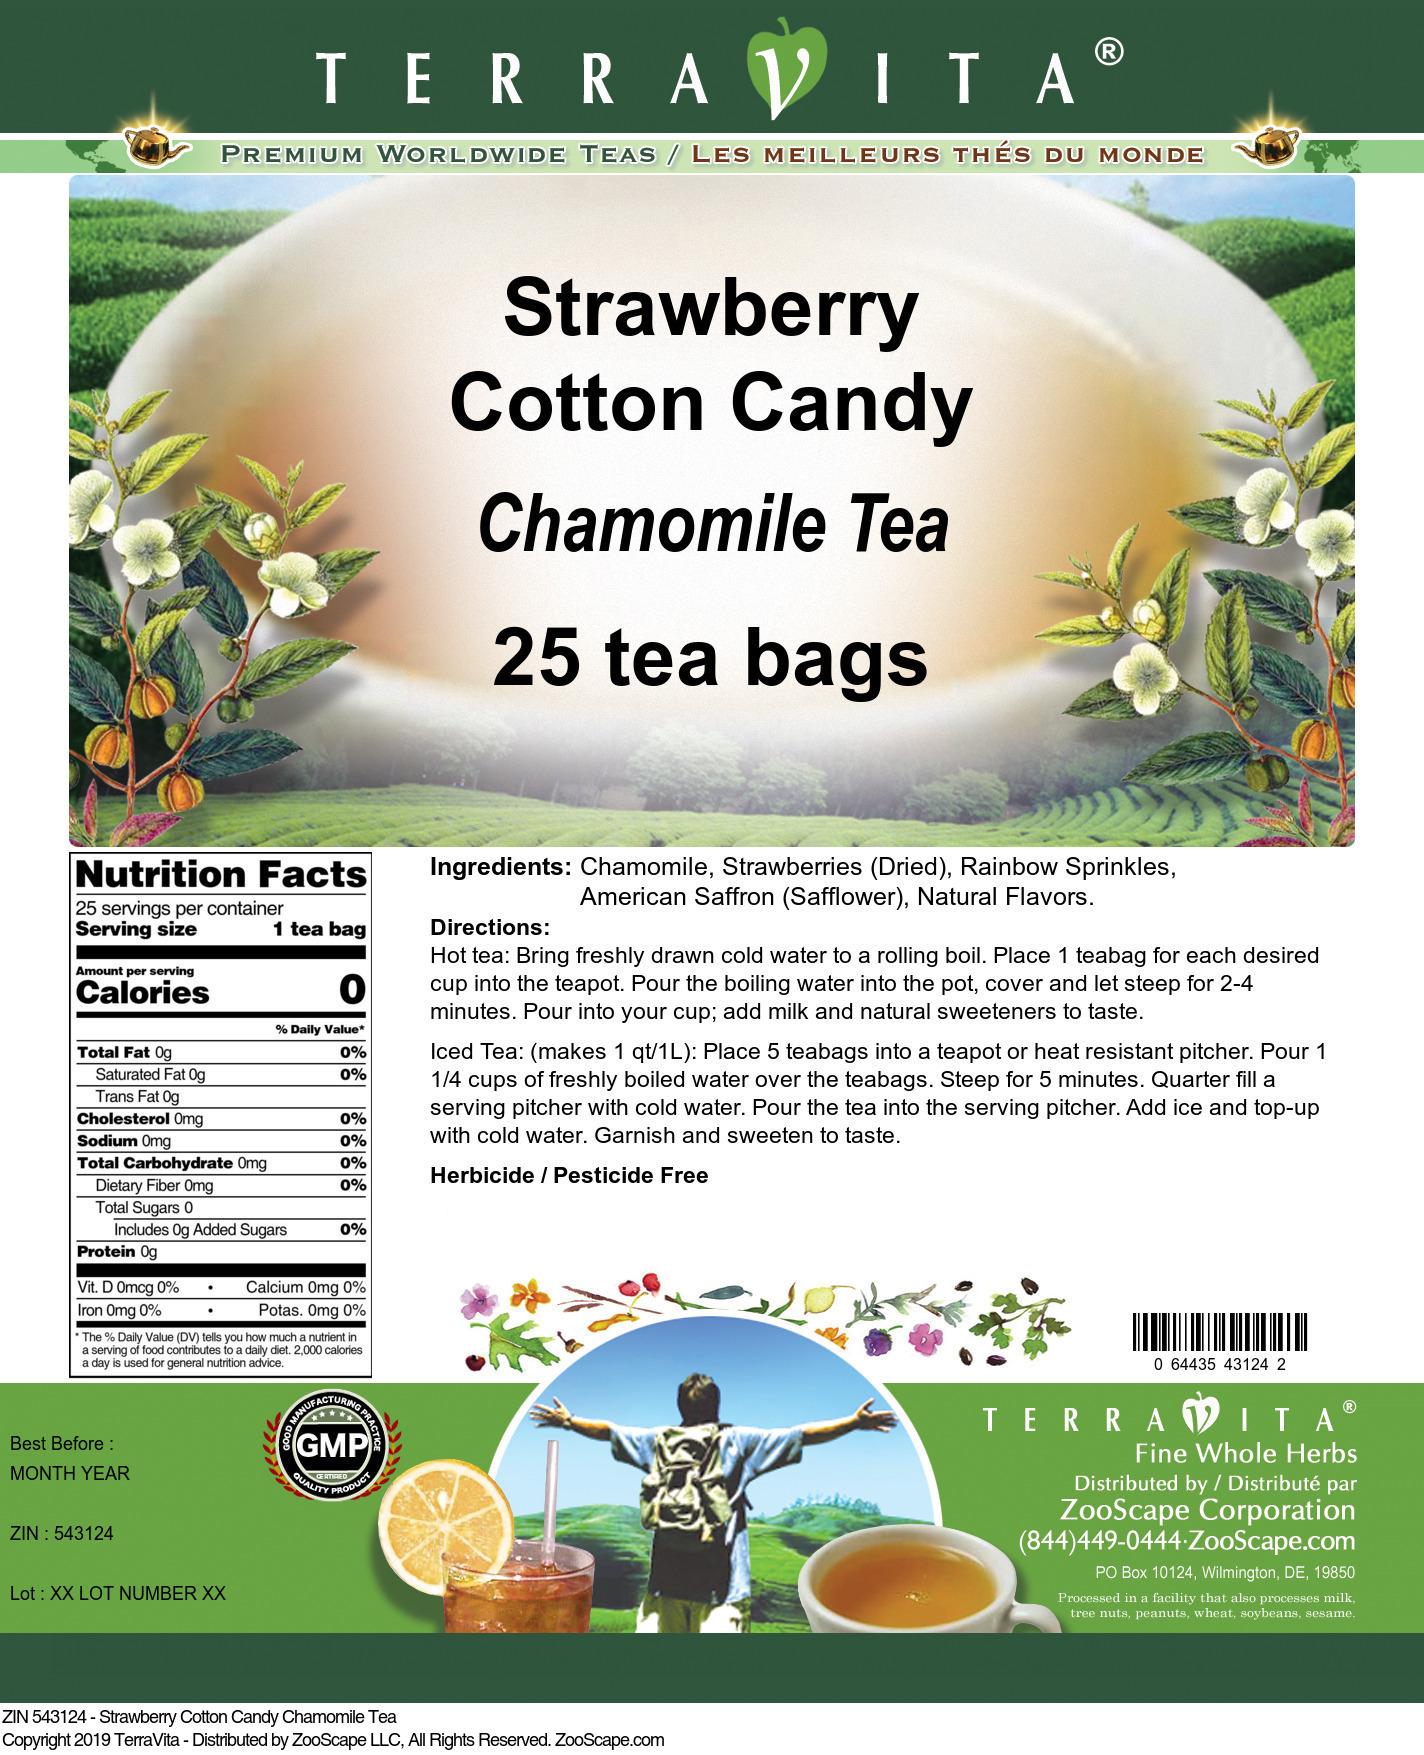 Strawberry Cotton Candy Chamomile Tea